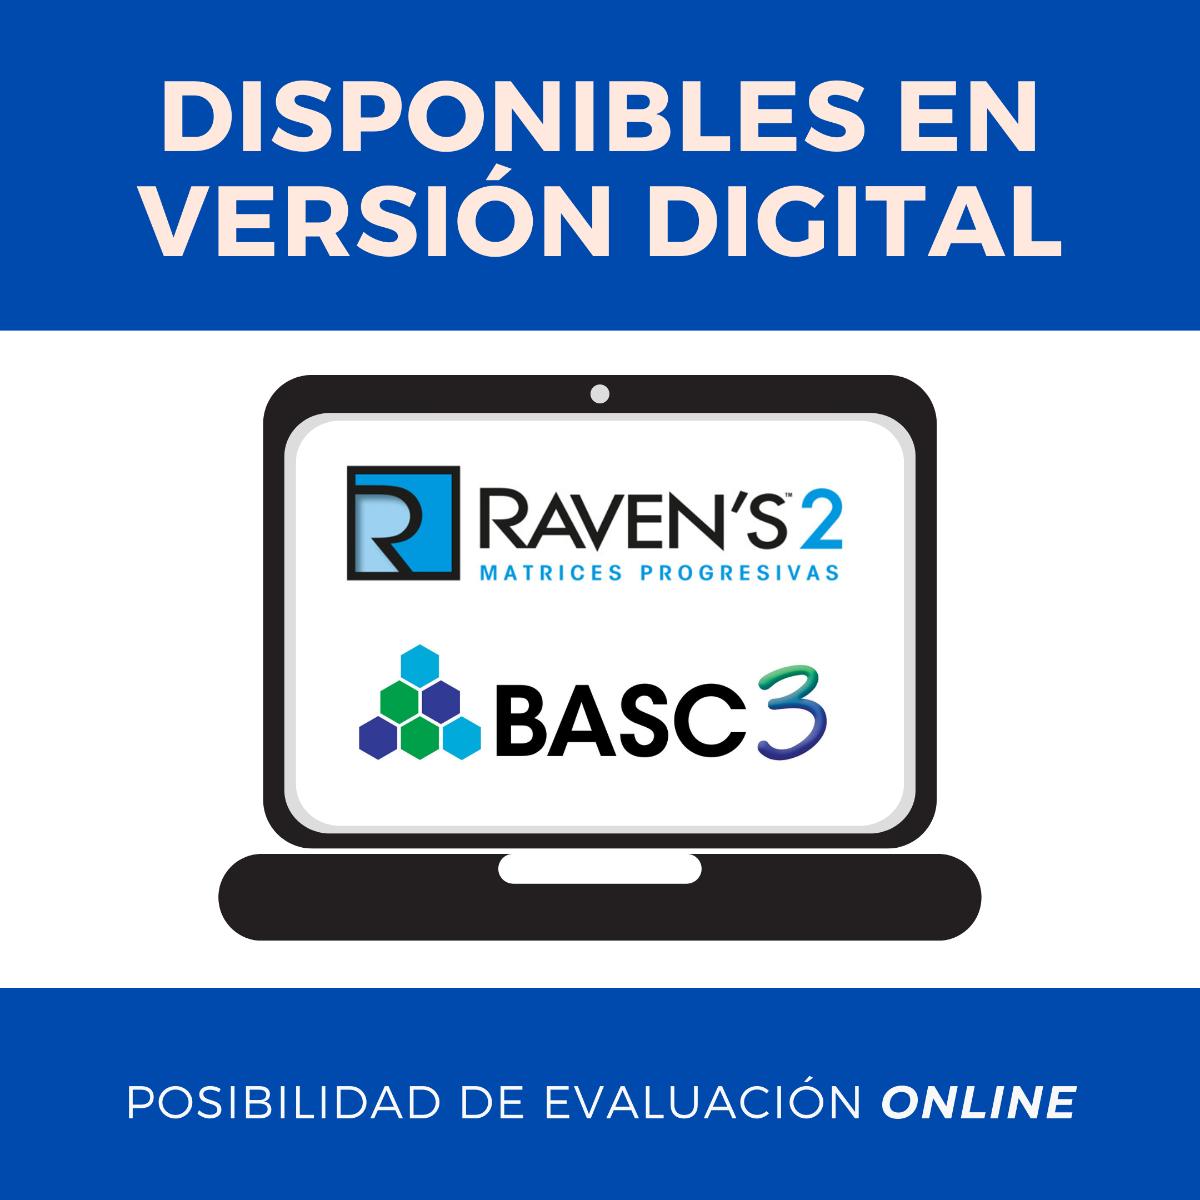 Raven_s_2_y_BASC3_evaluaci_n_online